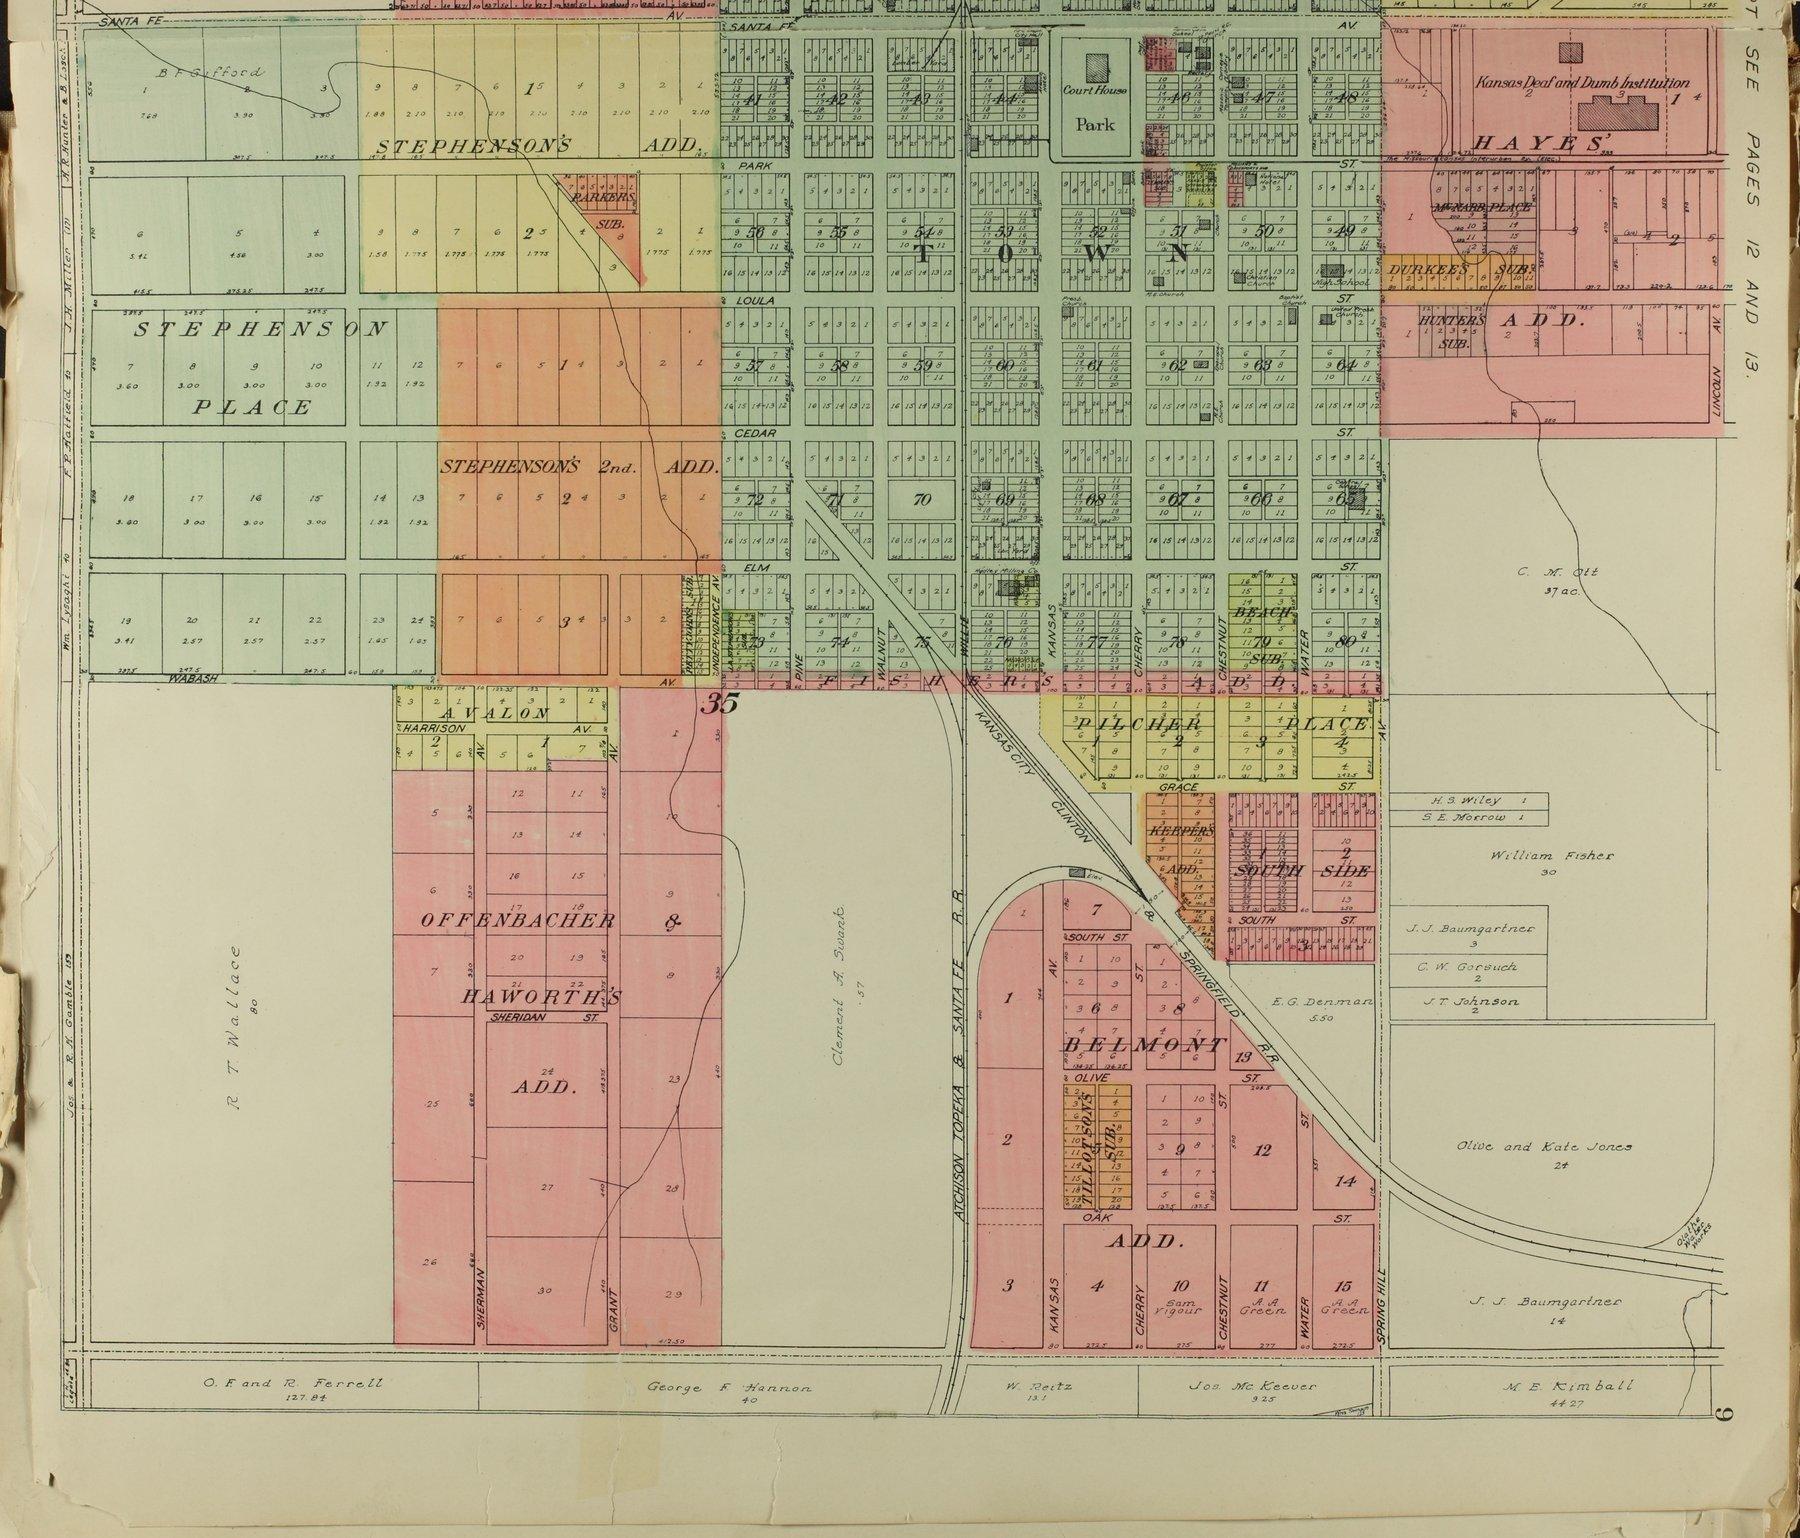 Standard atlas of Johnson County, Kansas - 9